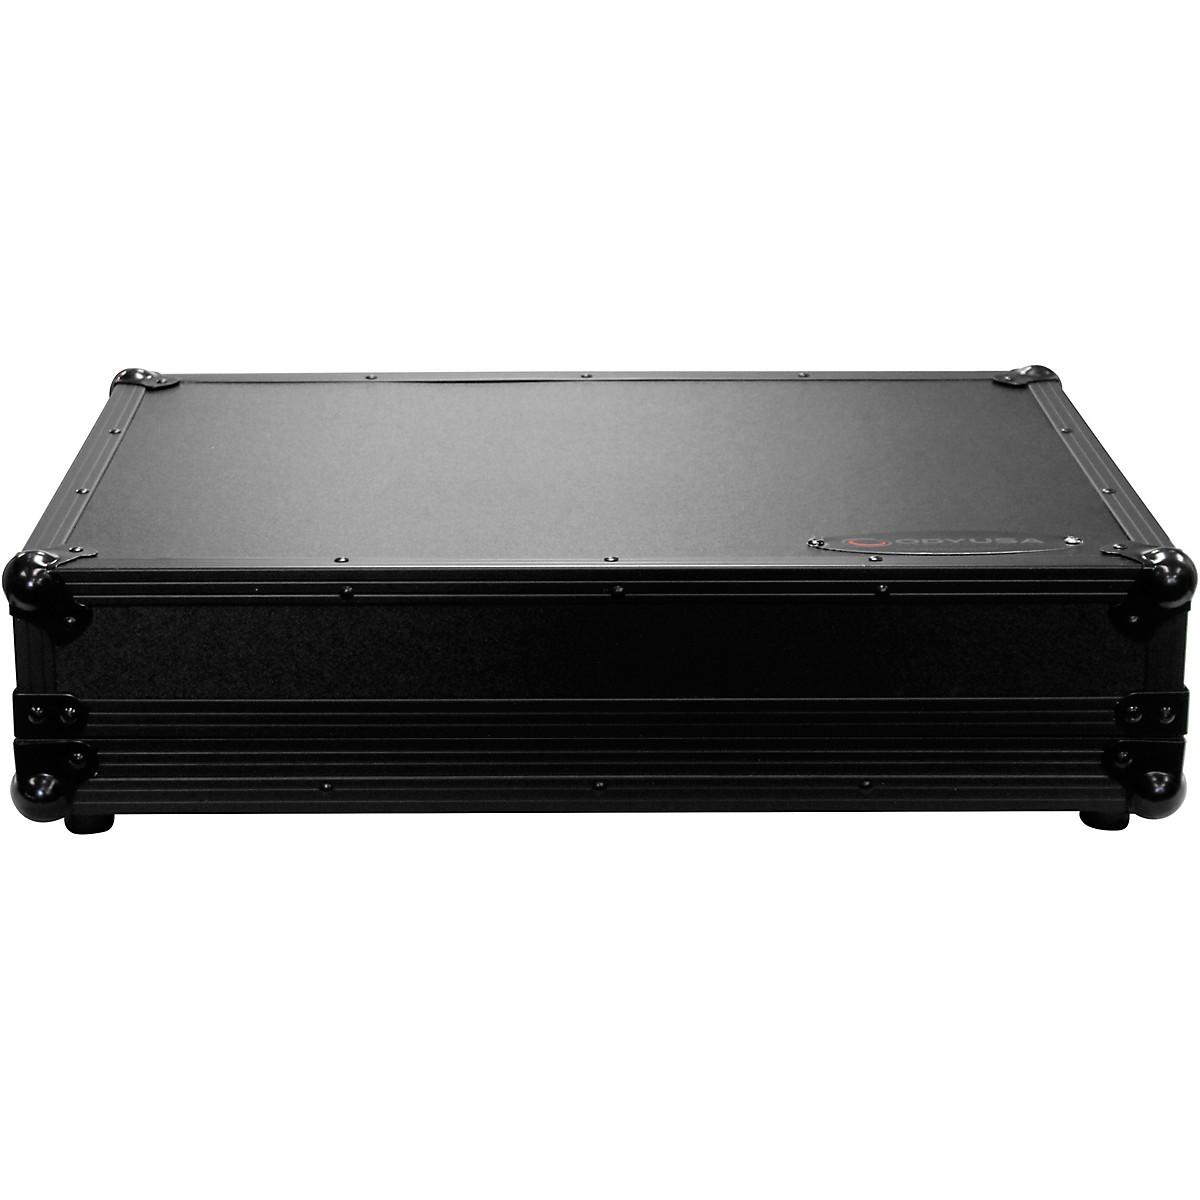 Odyssey FRPIDDJRRBL Black Label Low Profile Pioneer DDJ-RR / DDJ-SR DJ Controller Case